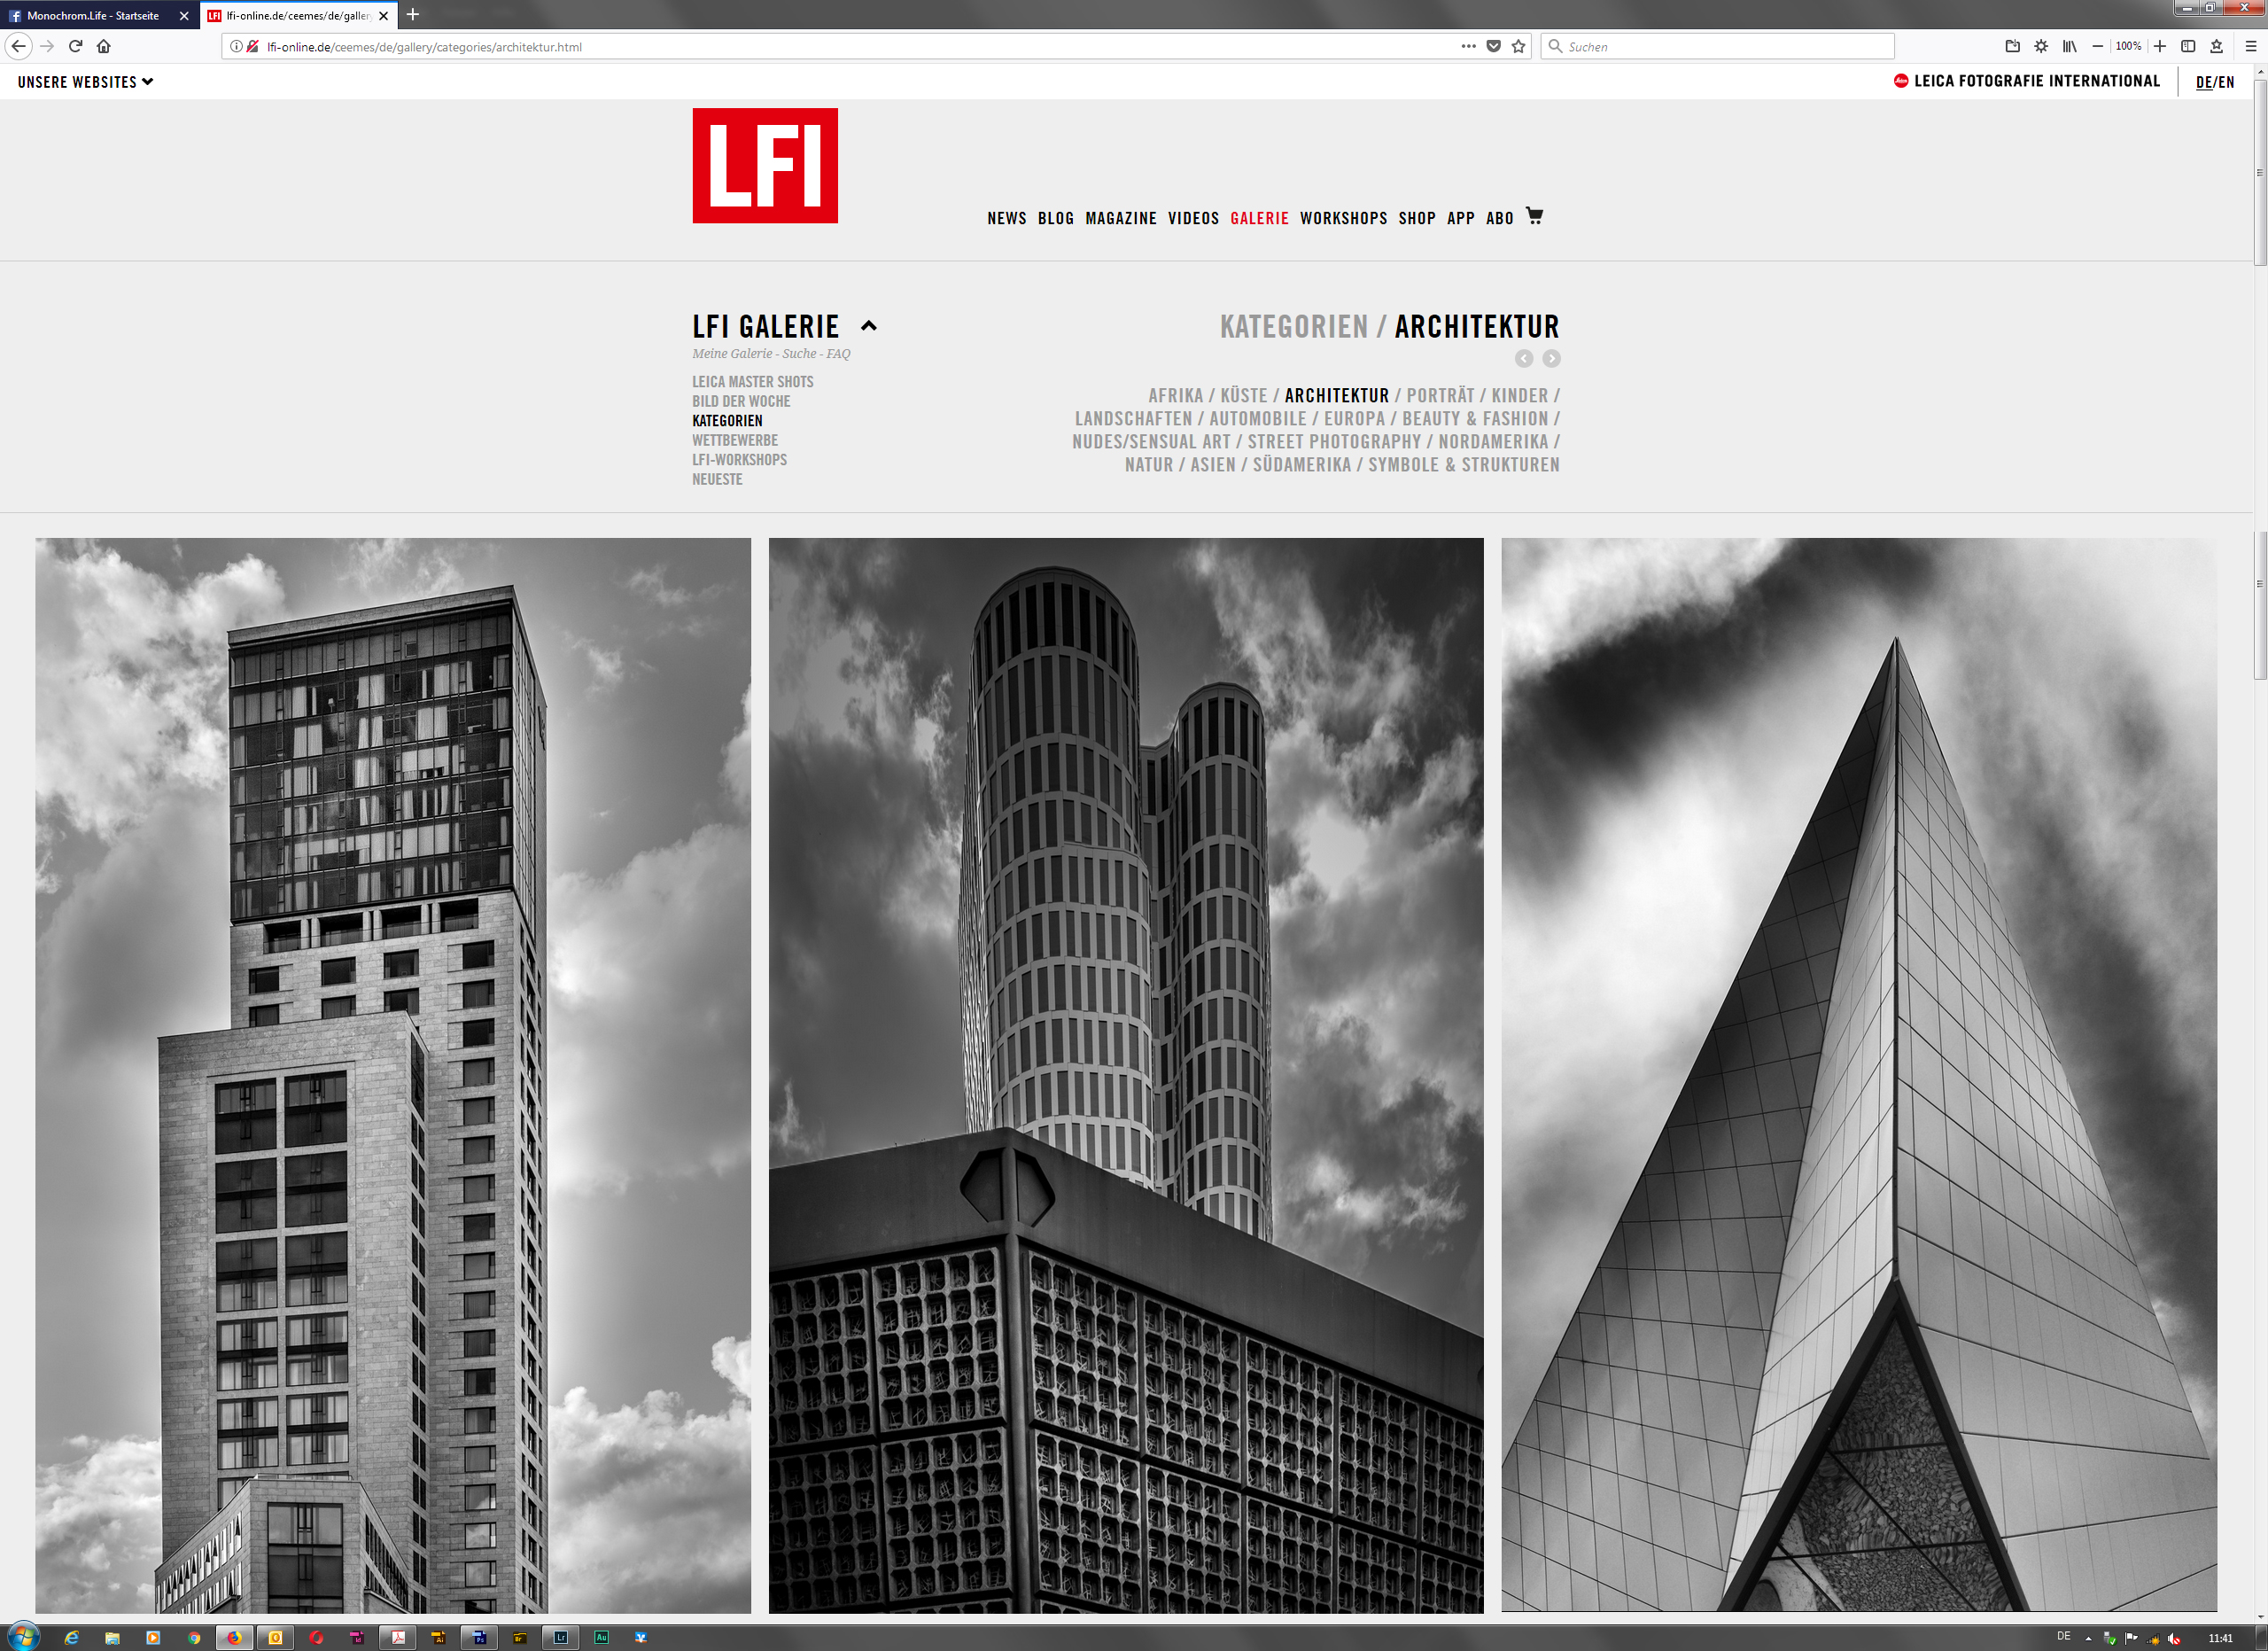 LFI_Architektur_01_2018 by .